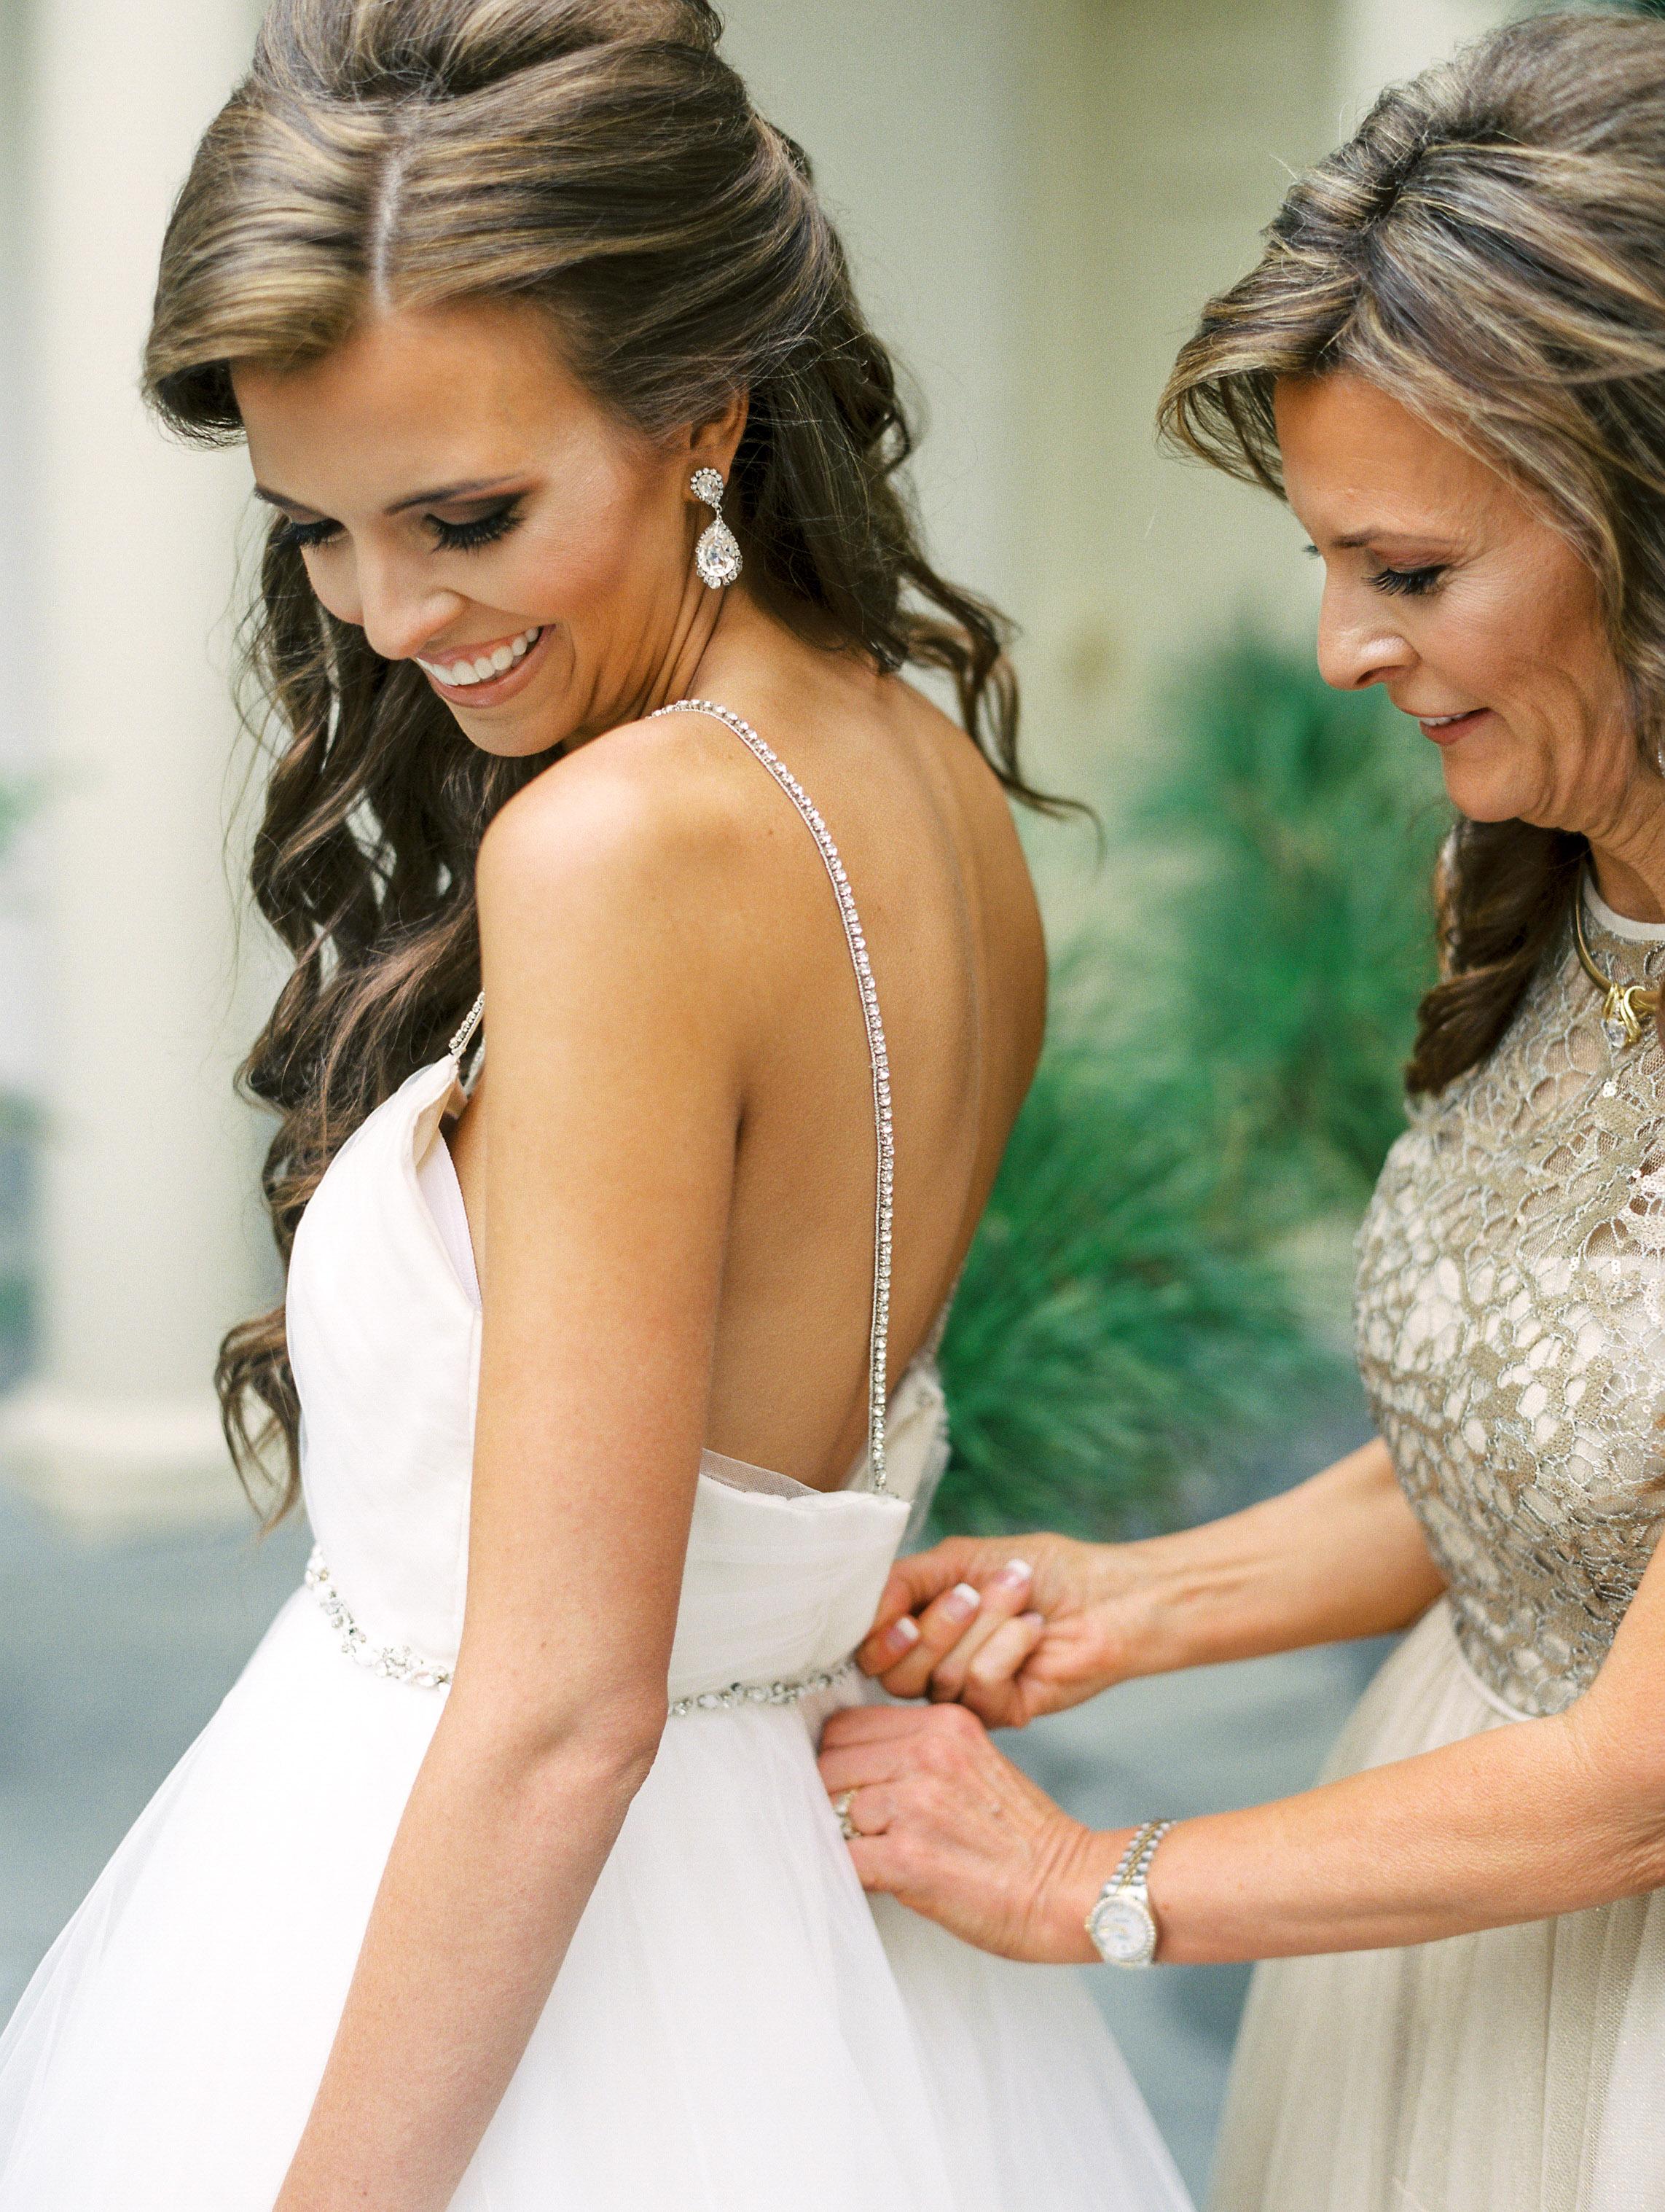 Dana-Fernandez-Photography-Weddings-in-Houston-Magazine-feature-Houston-wedding-photographer-film-7.jpg